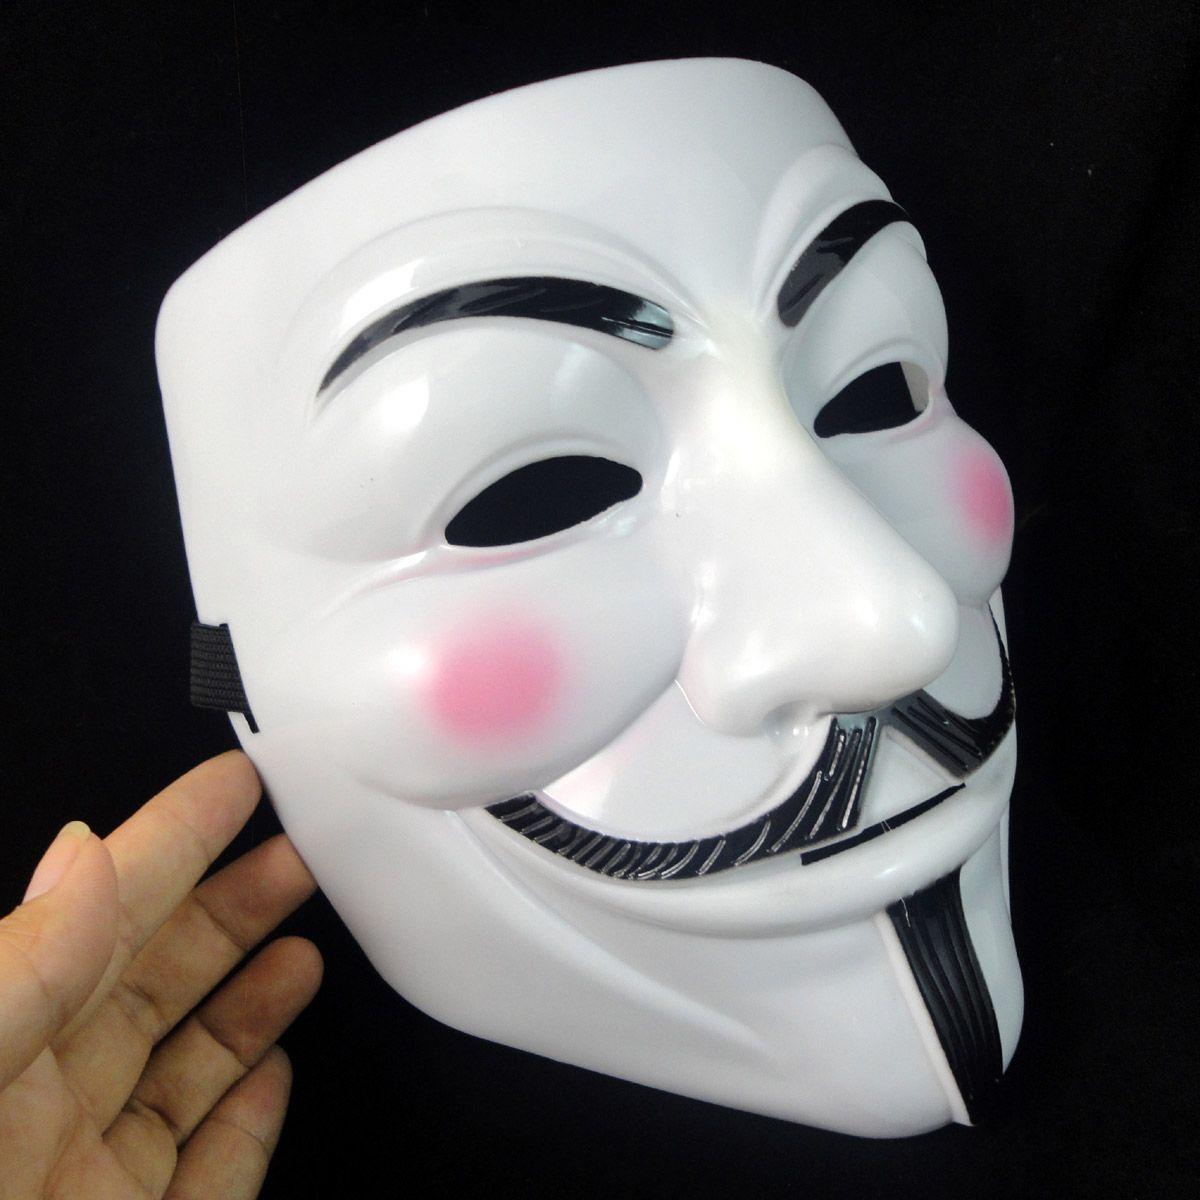 Uy Fawkes V Vendetta Team Pink Blood Scar Masquerade Masks ...